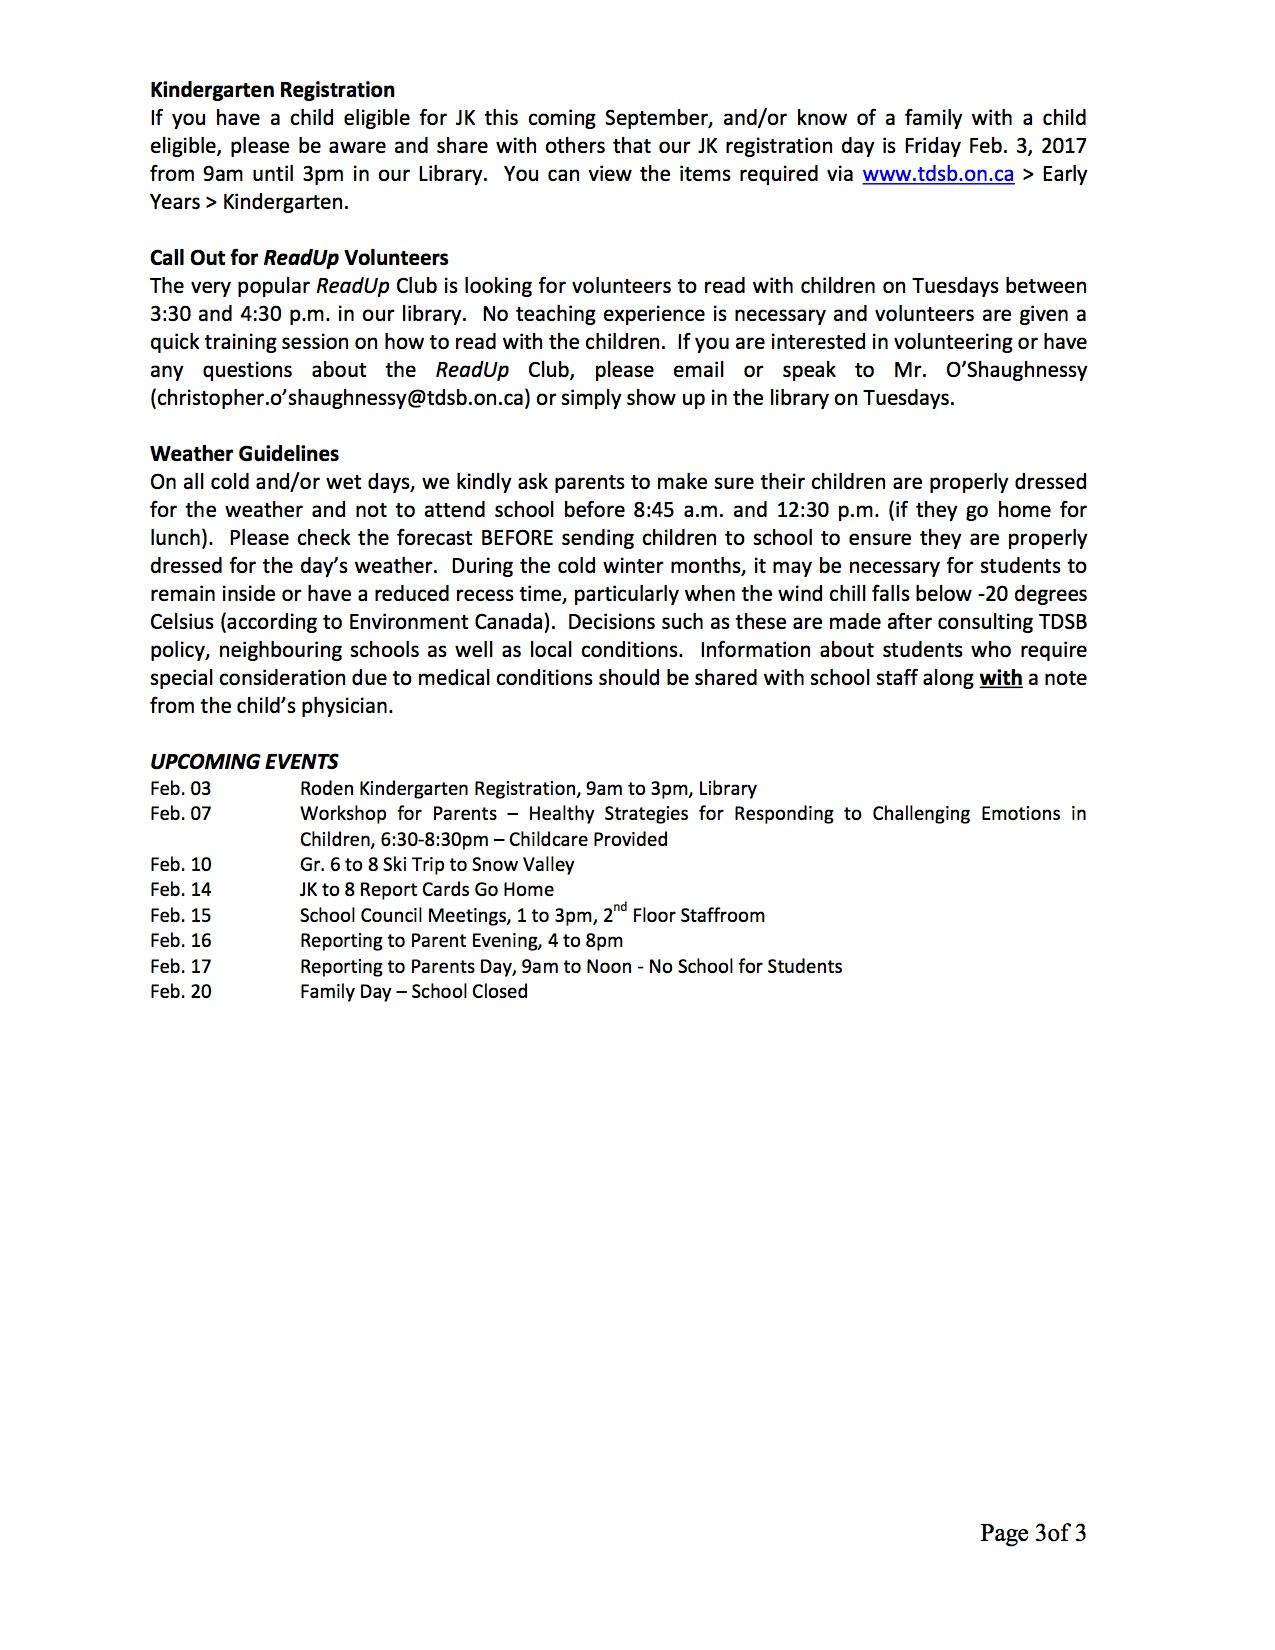 Roden Newsletter 17-02-02p3